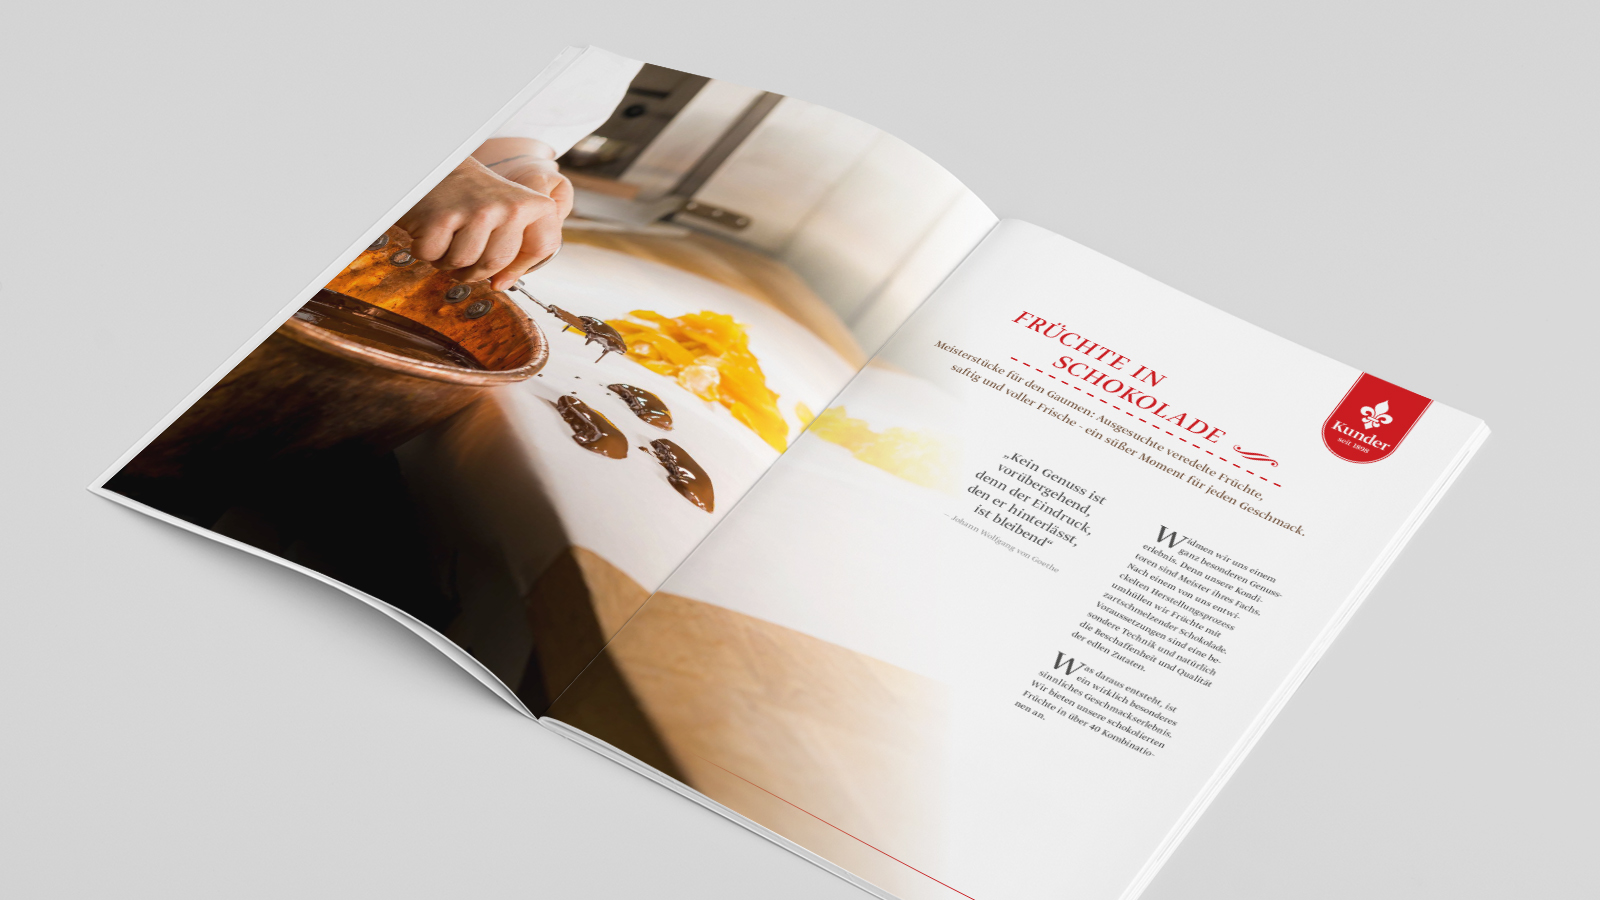 kunder-confiserie-katalog-fruechte